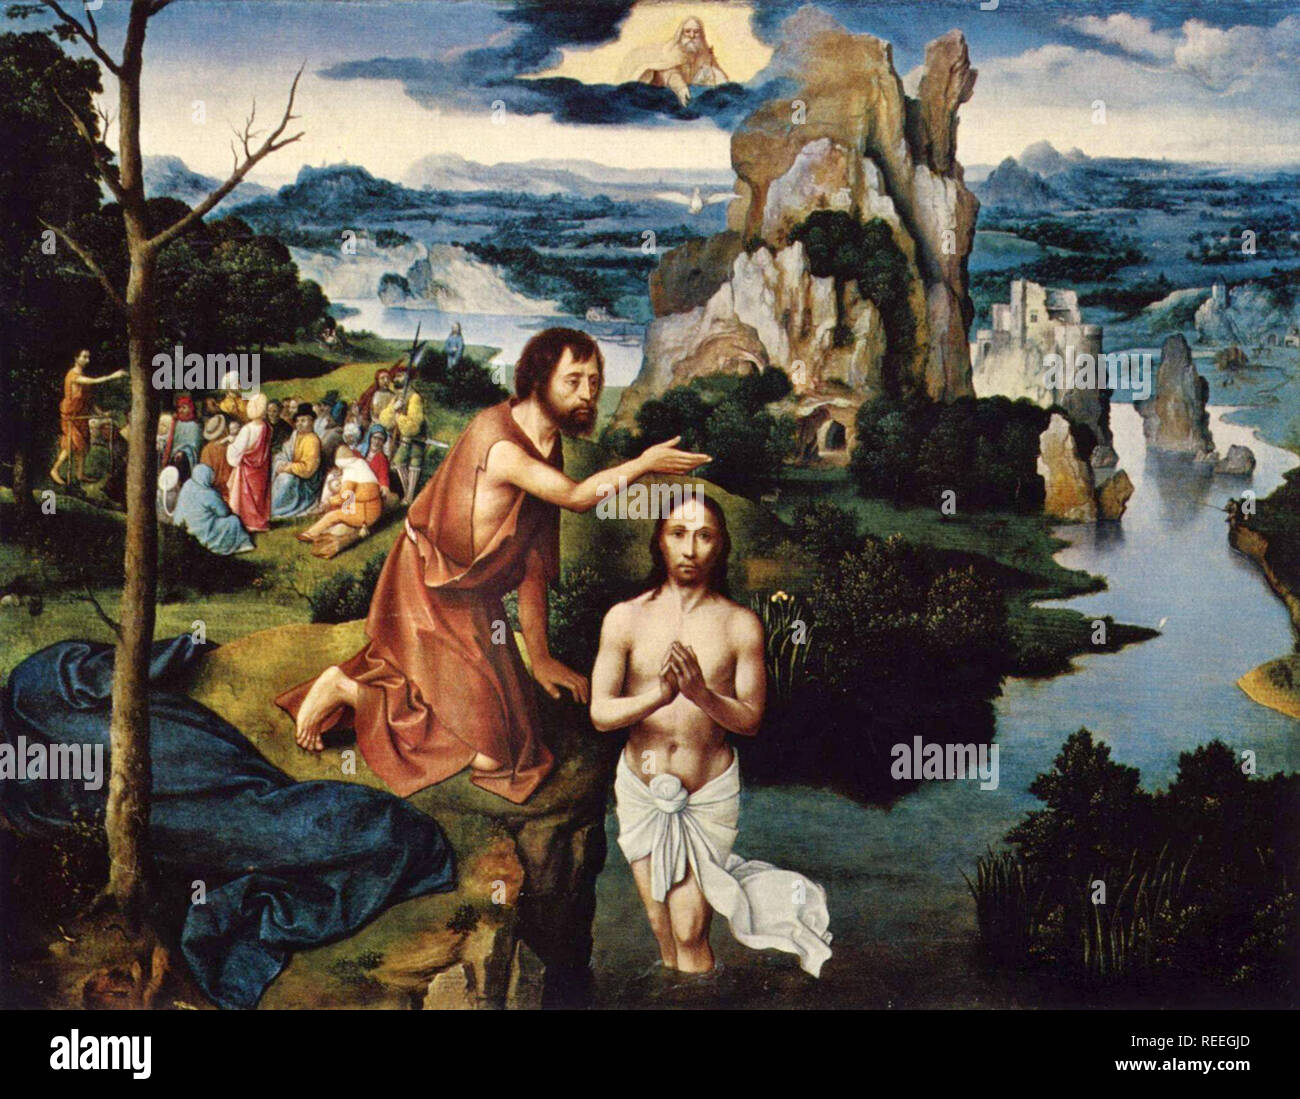 Baptism of Christ by Joachim Patinir - Stock Image